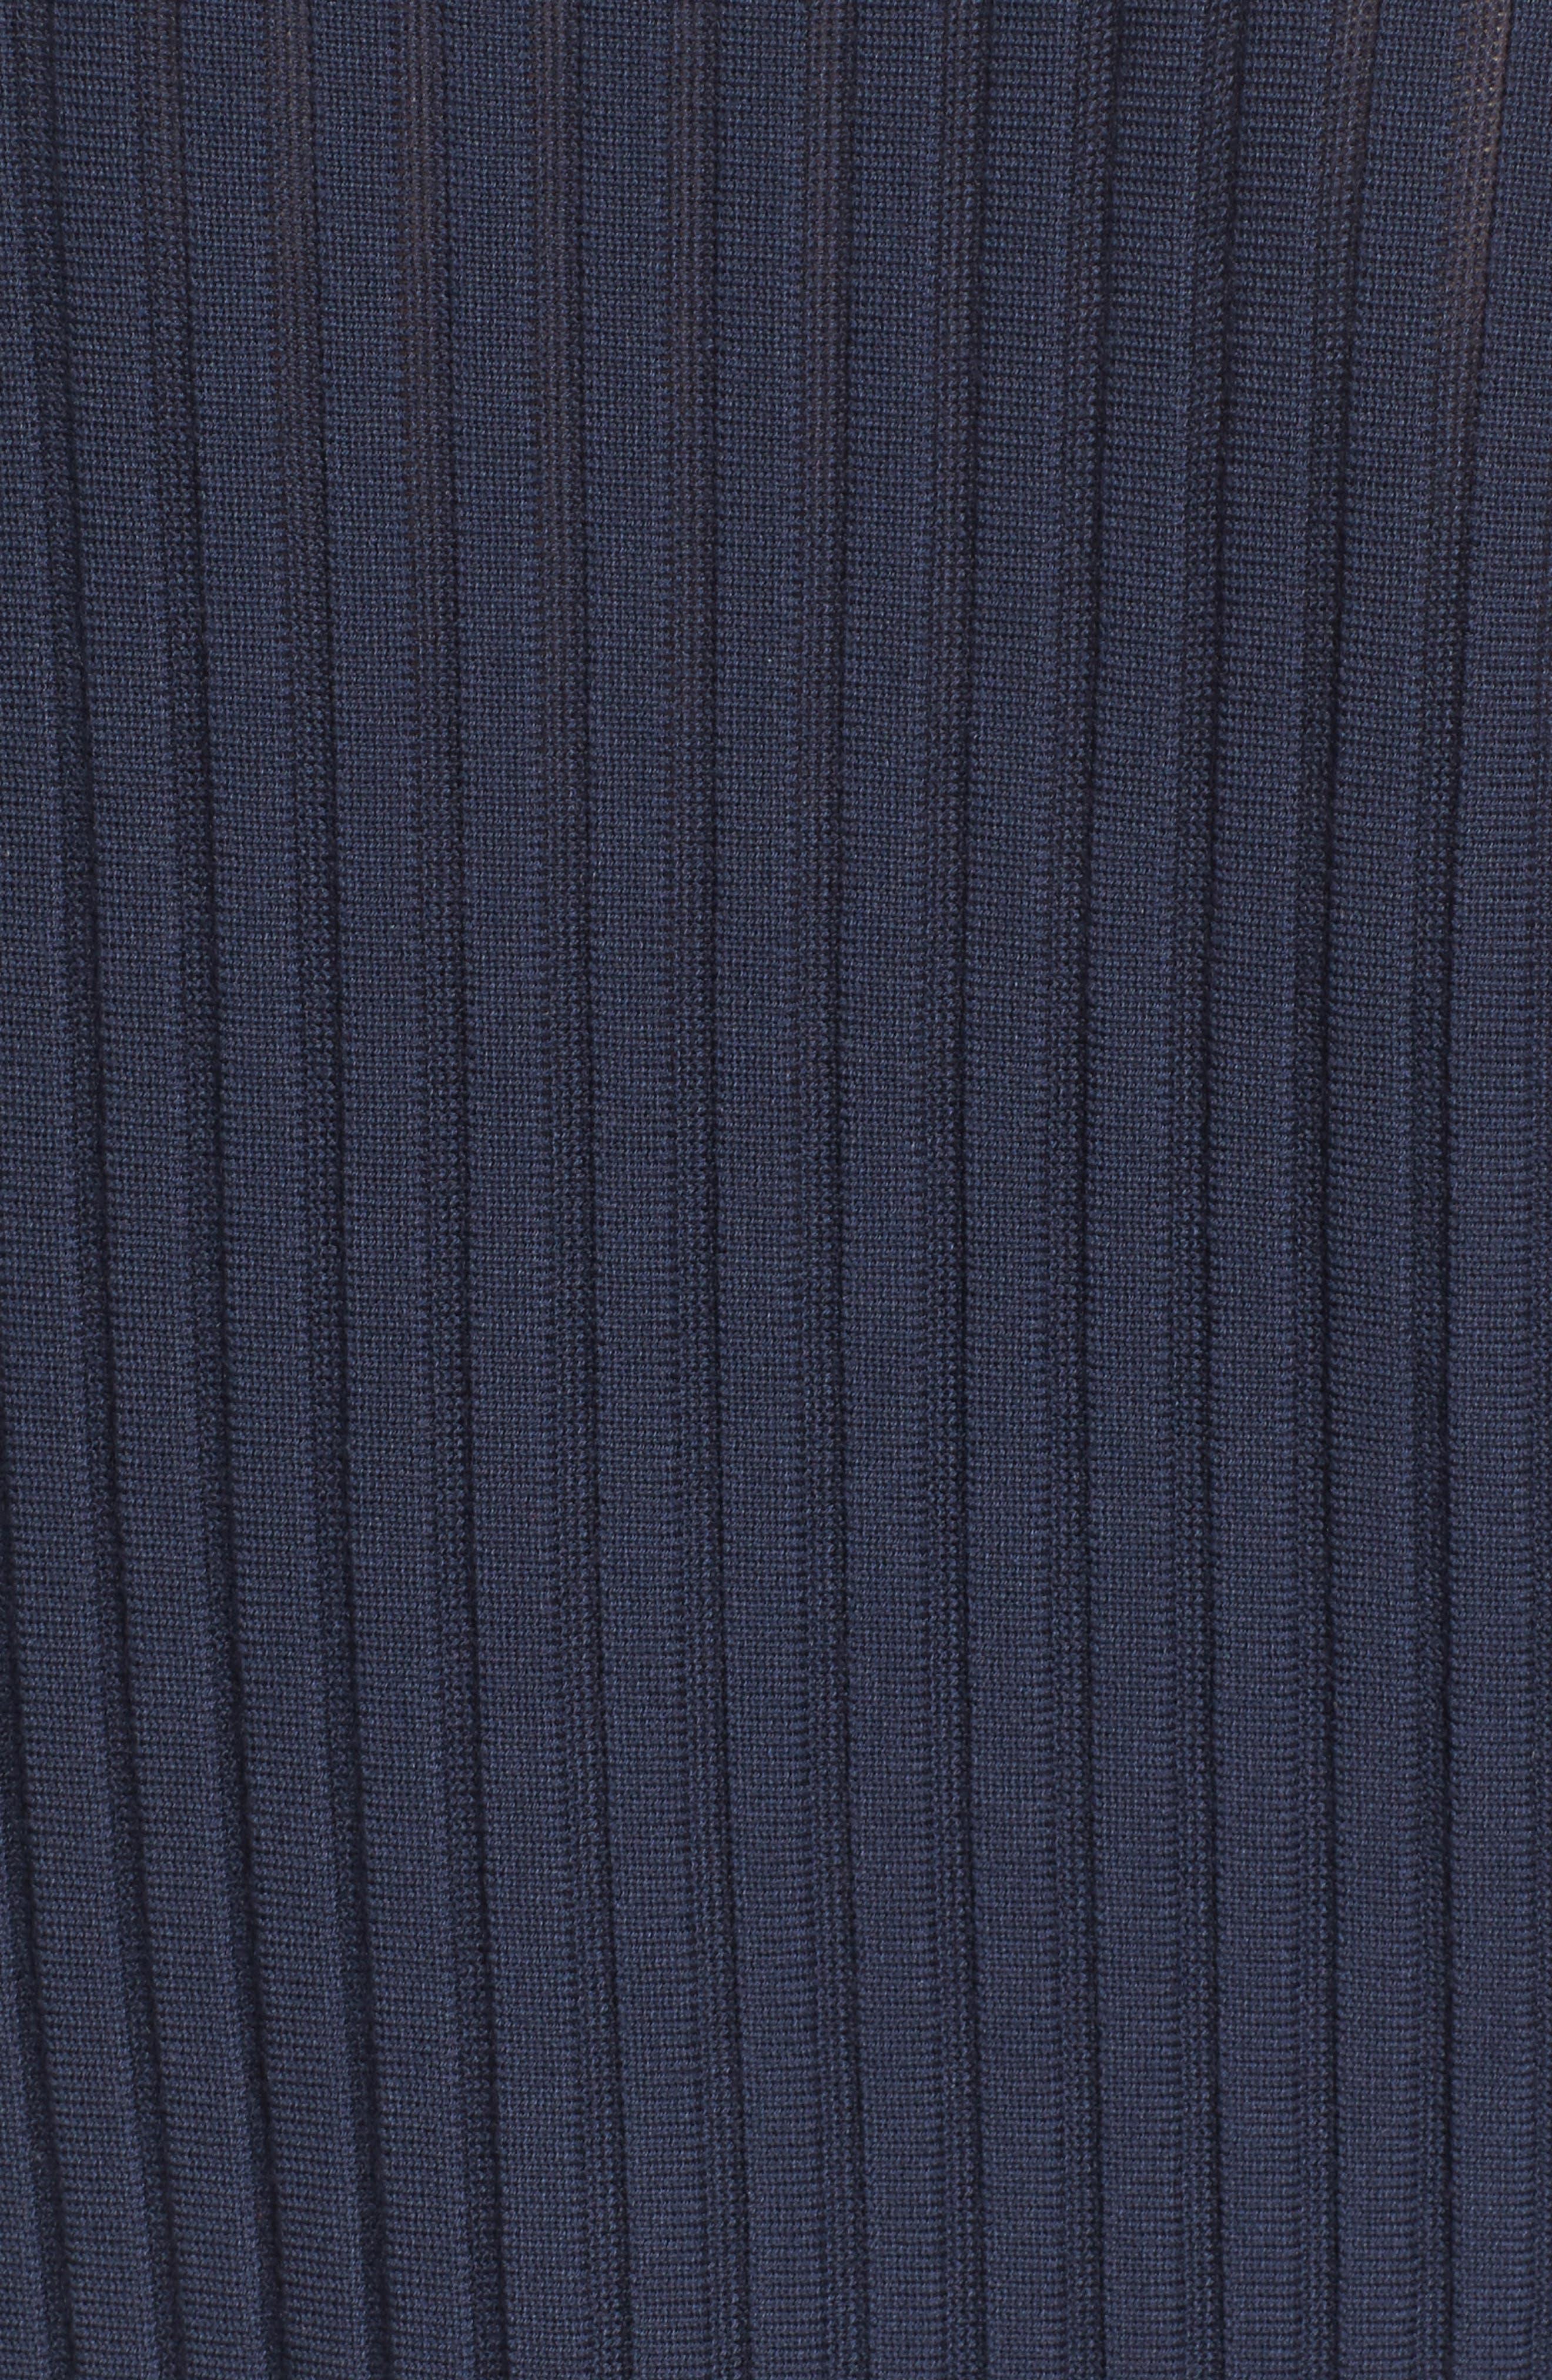 Ribbed Bateau Neck Sweater,                             Alternate thumbnail 20, color,